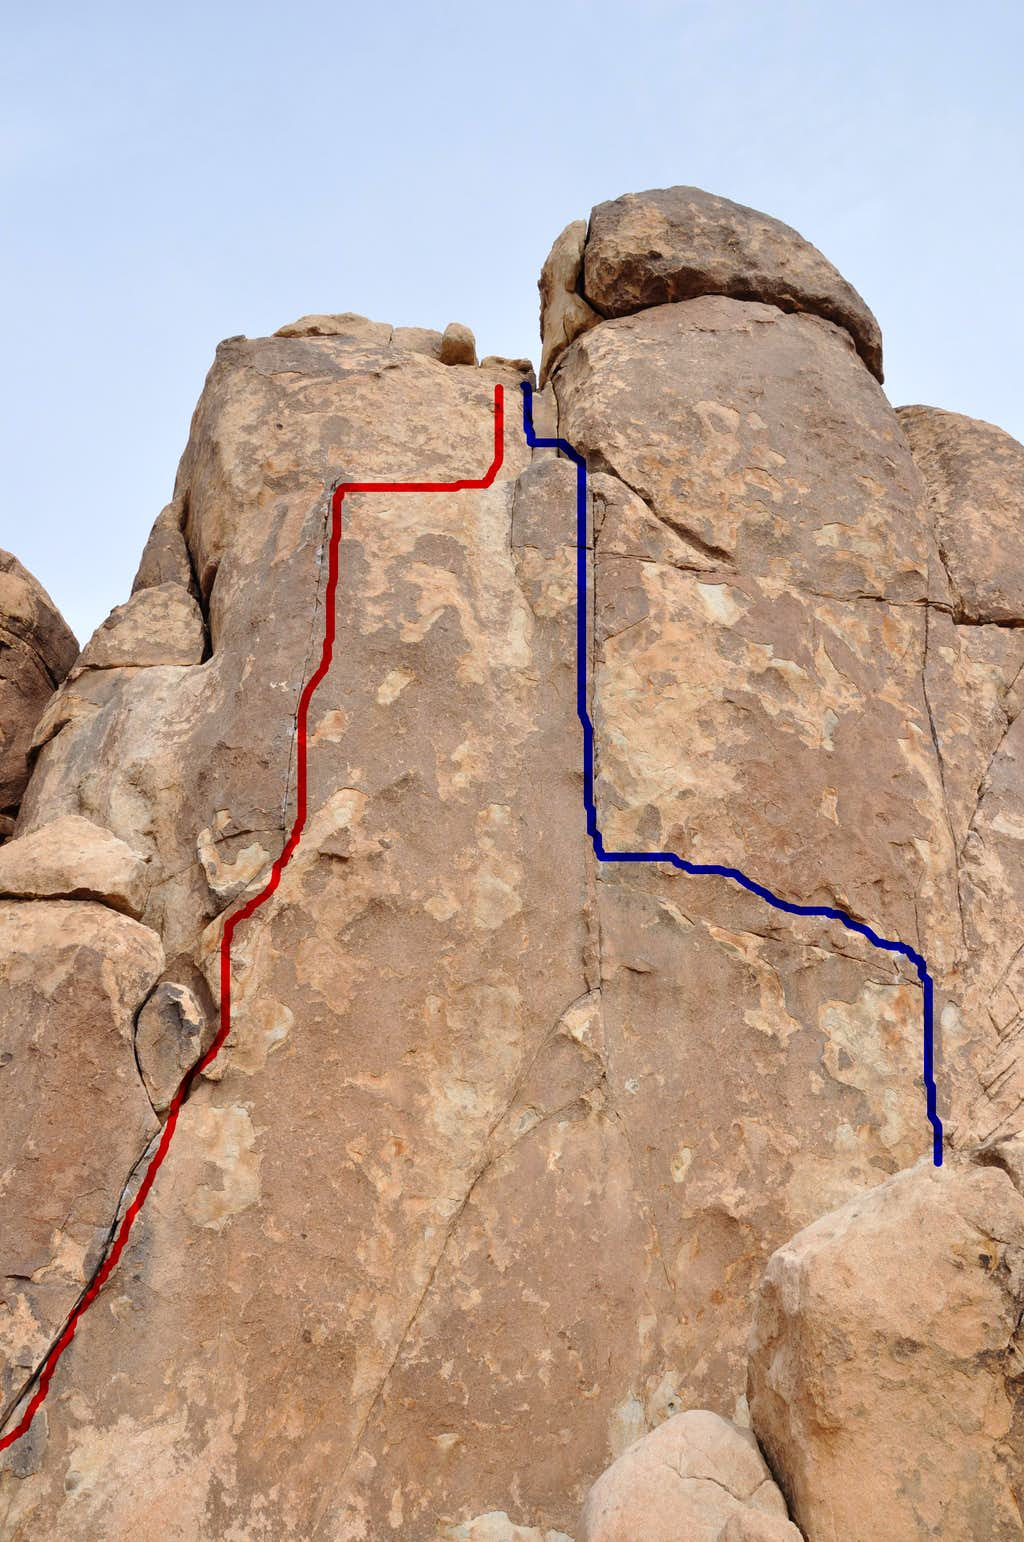 West Face of Sport Challenge Rock